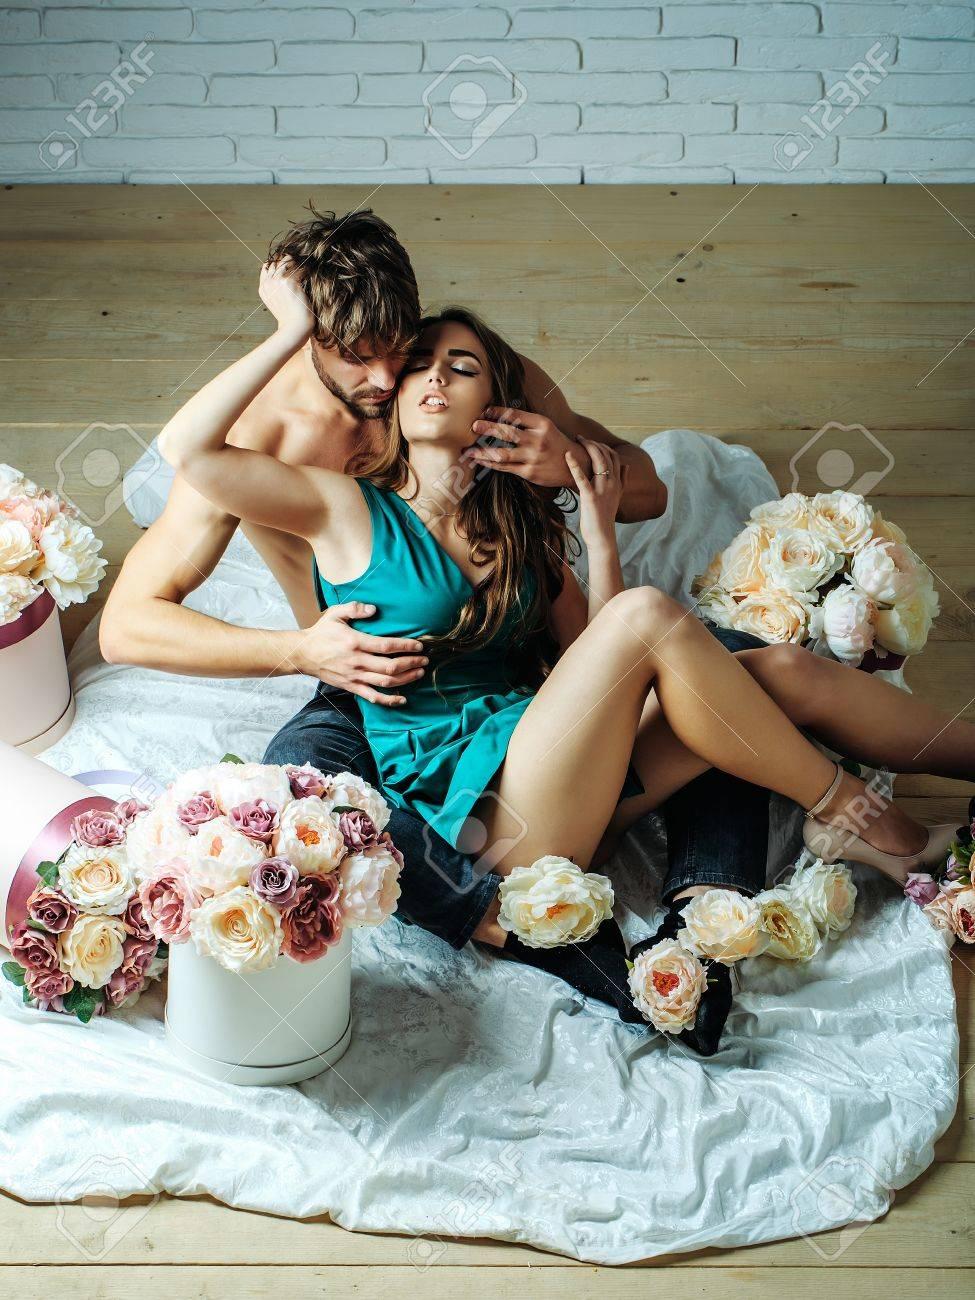 russian teen sex pictures